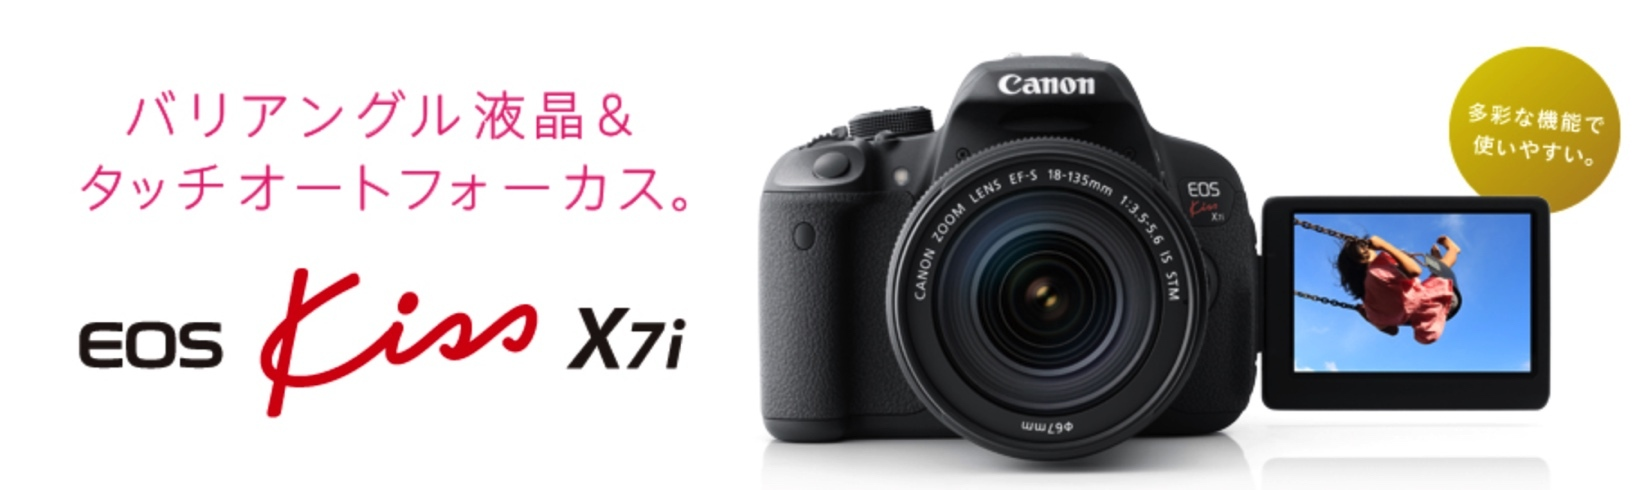 canon-eos-kiss-x7i